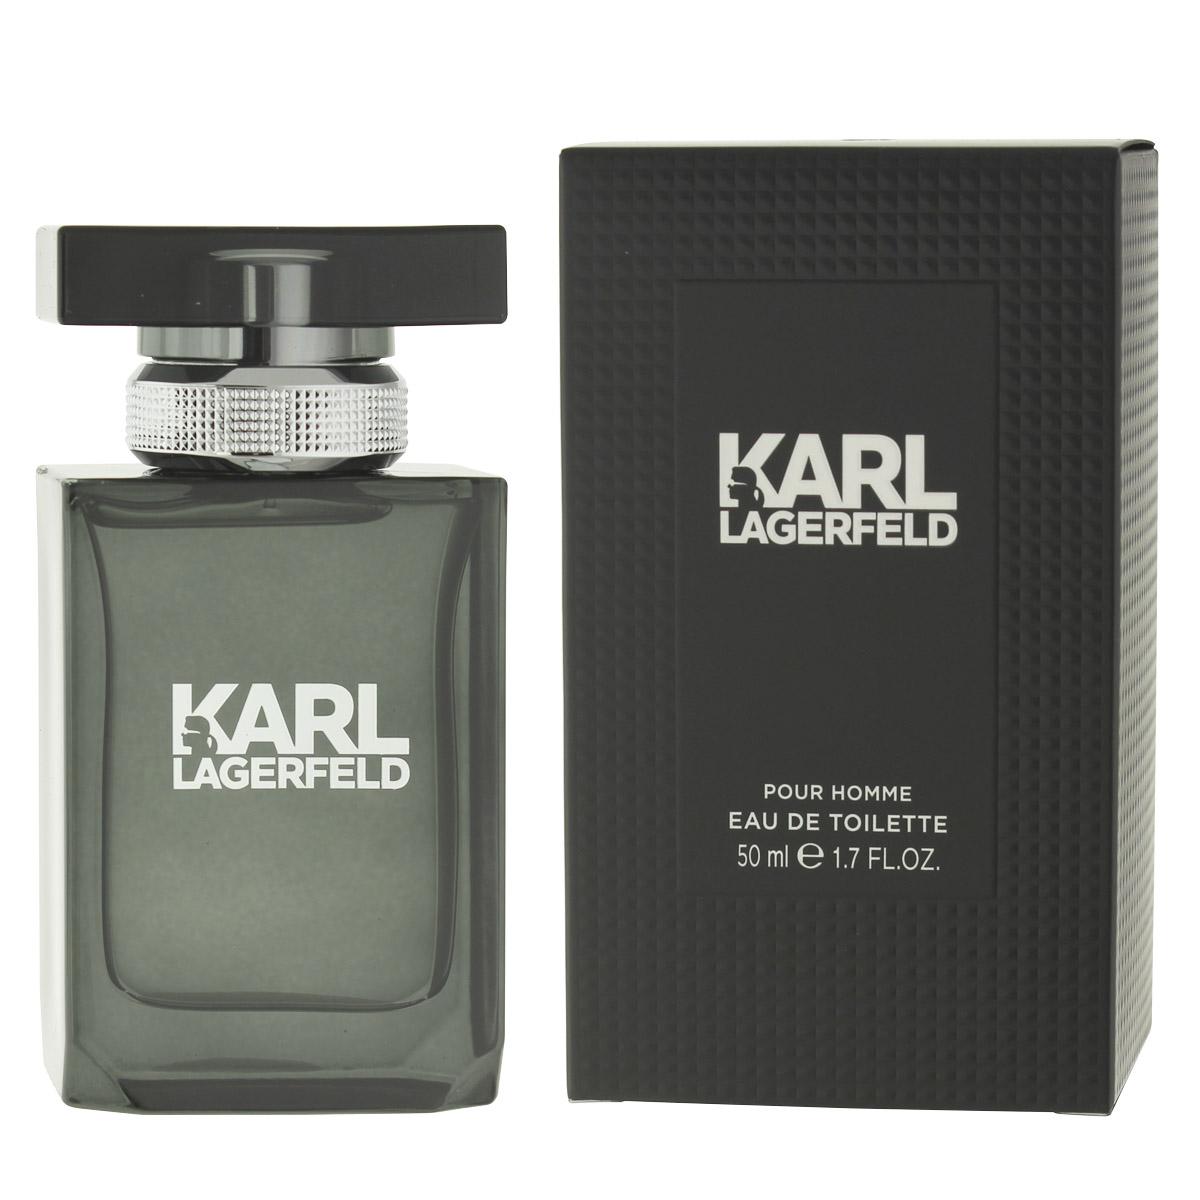 Karl Lagerfeld Karl Lagerfeld Pour Homme EDT 50 ml M